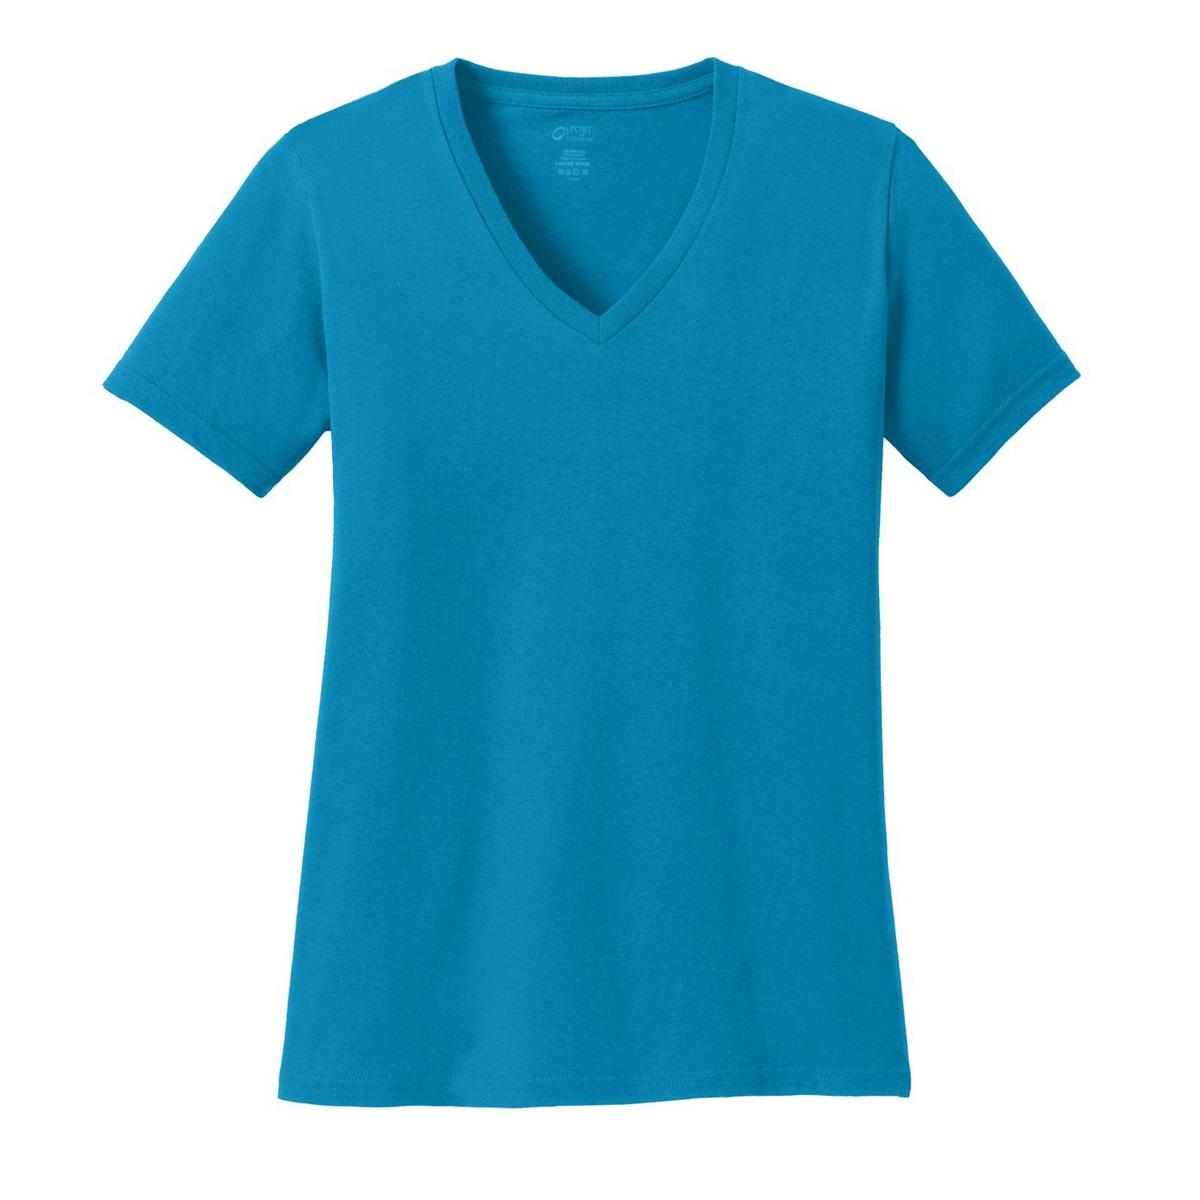 Port Company Lpc54v Ladies 5 4 Oz Cotton V Neck T Shirt